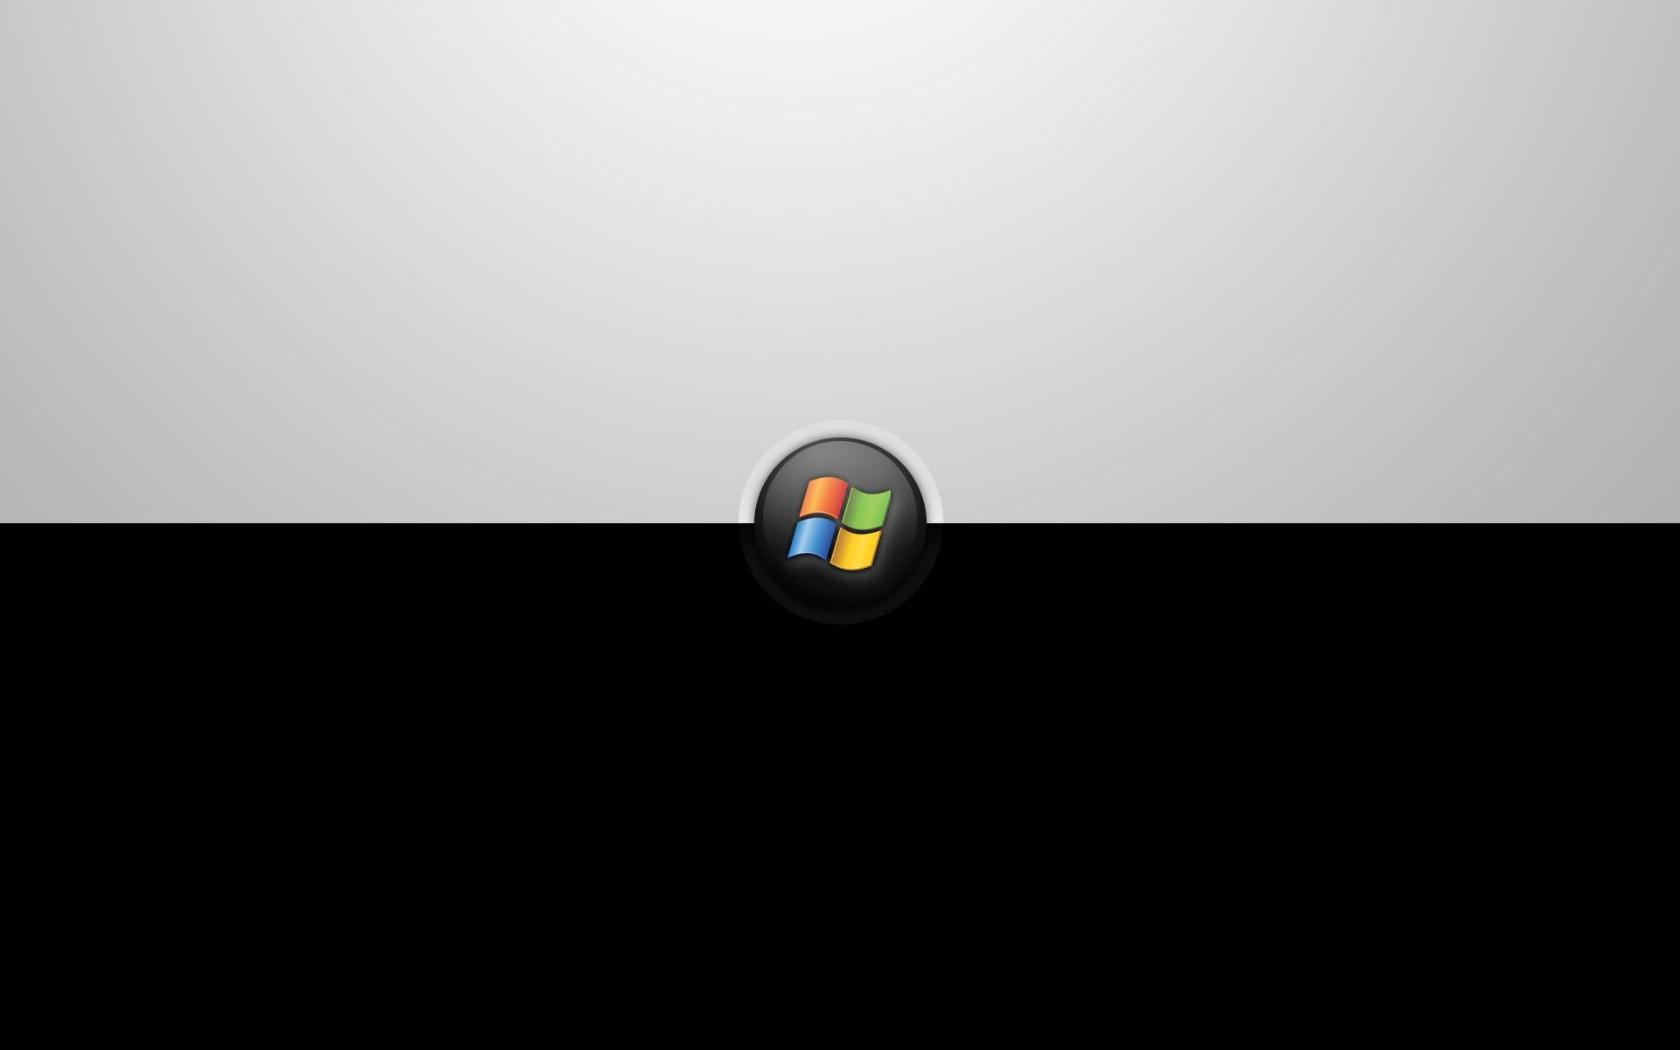 windows桌面壁纸-10_图片素材图片